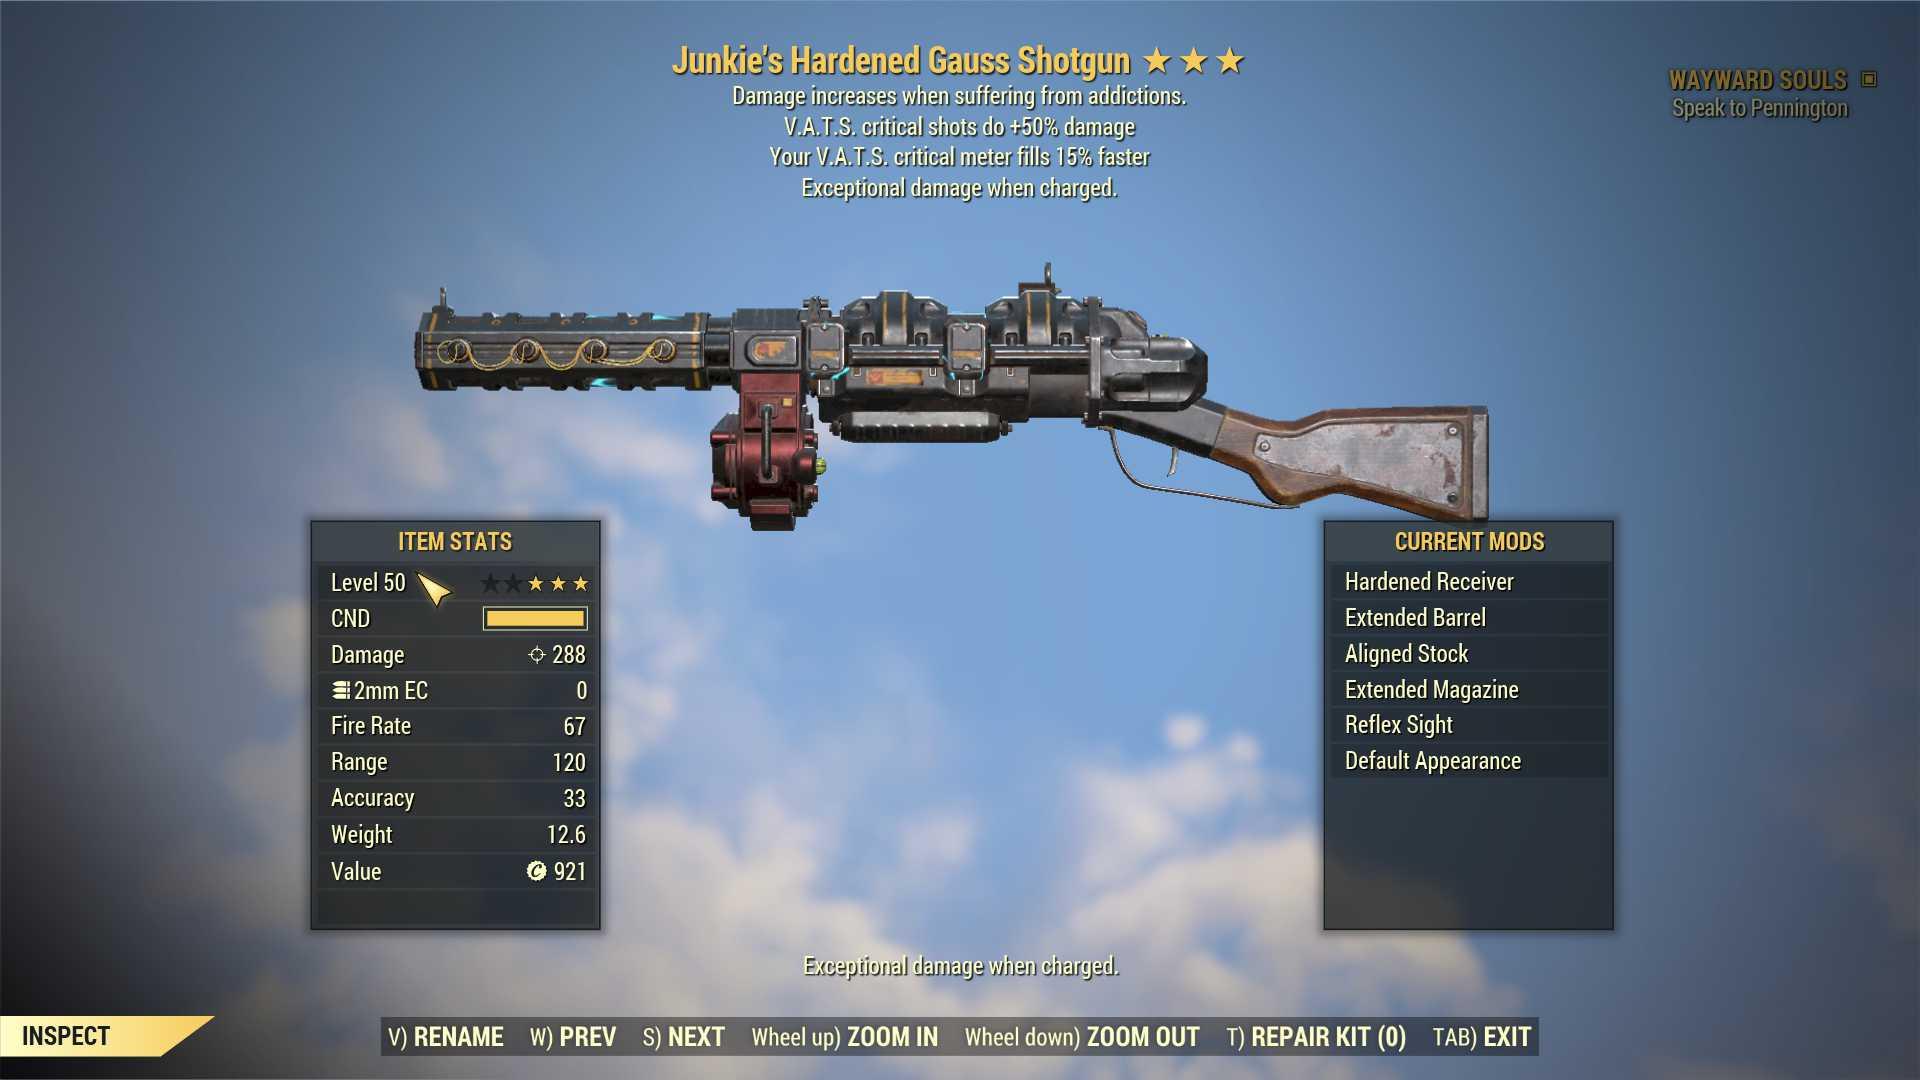 Junkie's Gauss Shotgun (+50% critical damage, VATS crit fills 15% faster) FULL MODDED [Wastelanders]